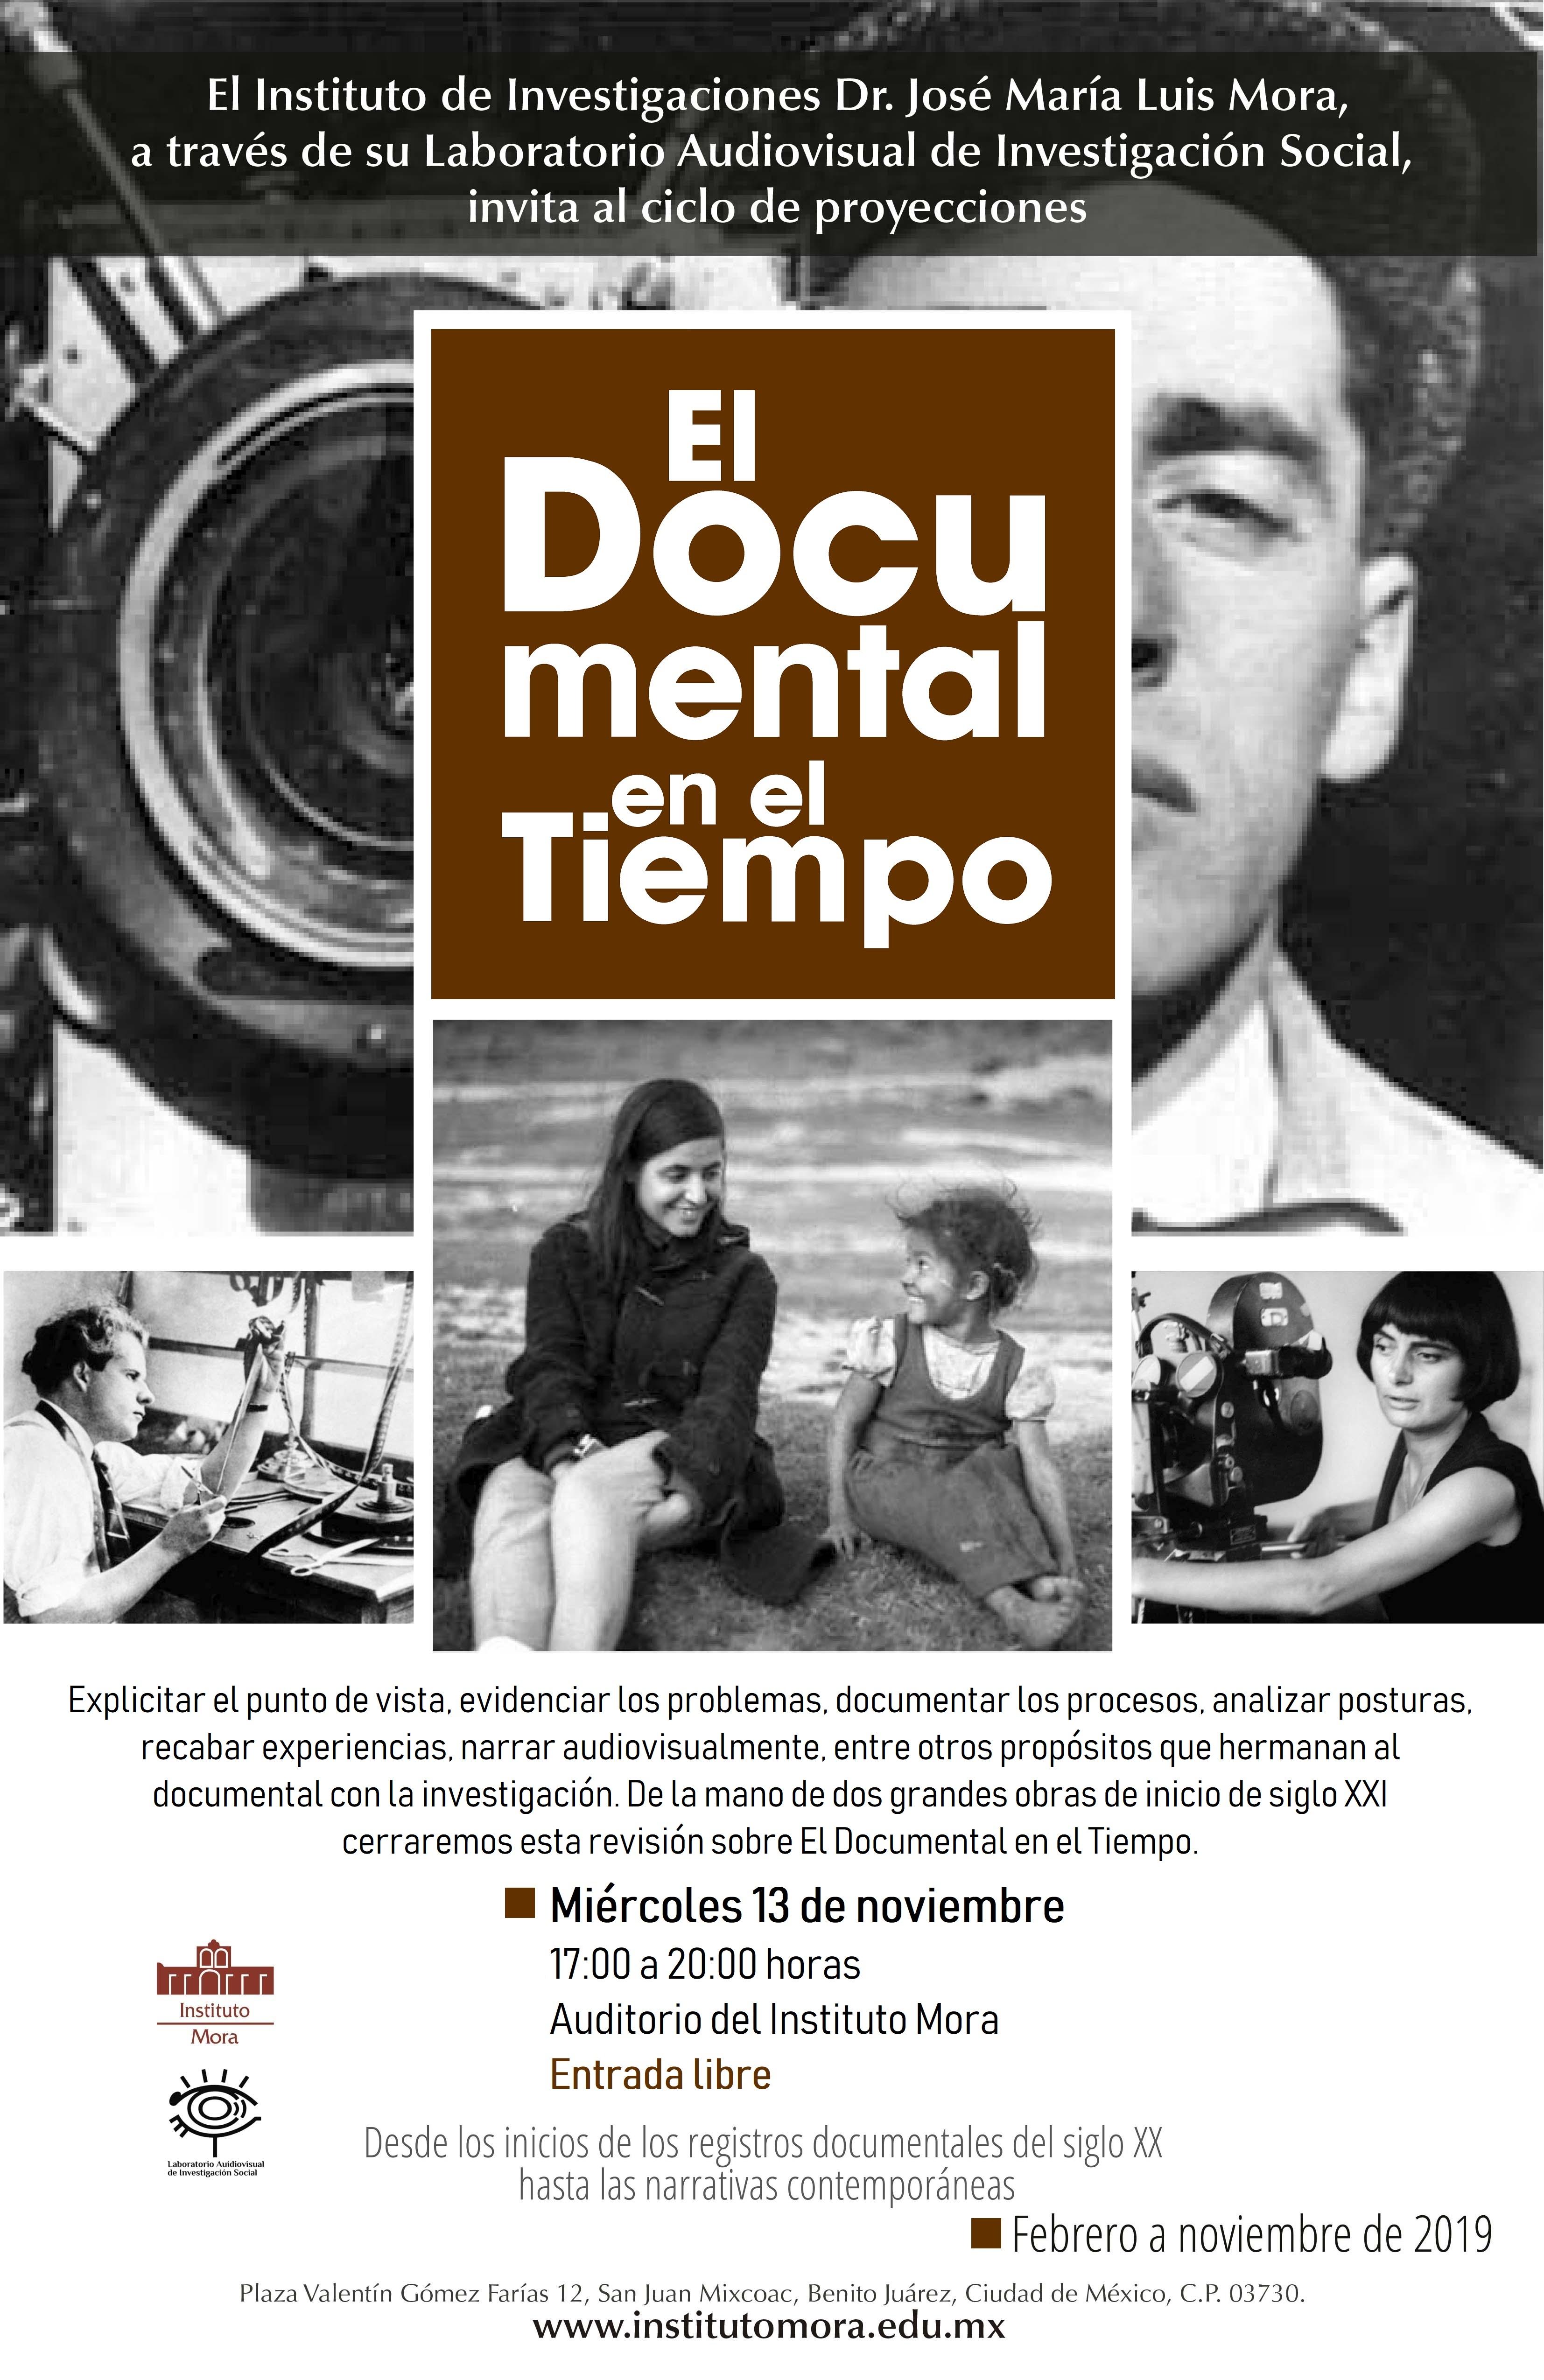 https://www.institutomora.edu.mx/Instituto/IE/1017_IEPry01-1119.jpg